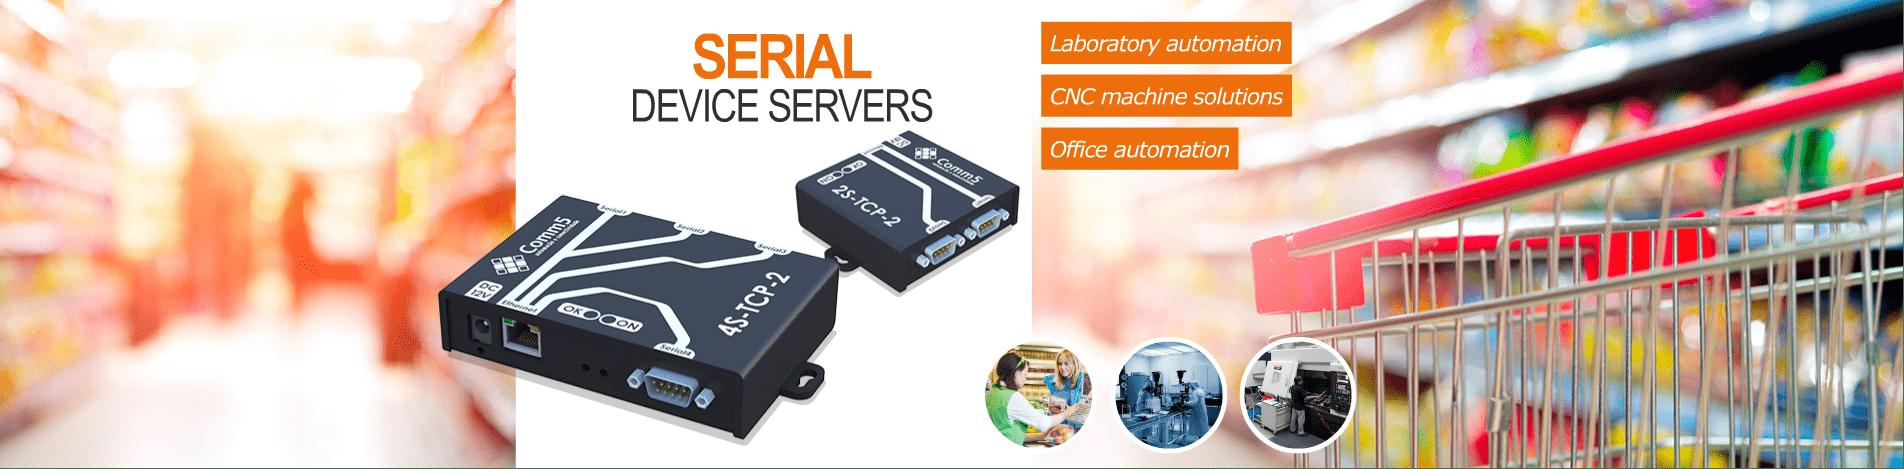 Serial device servers